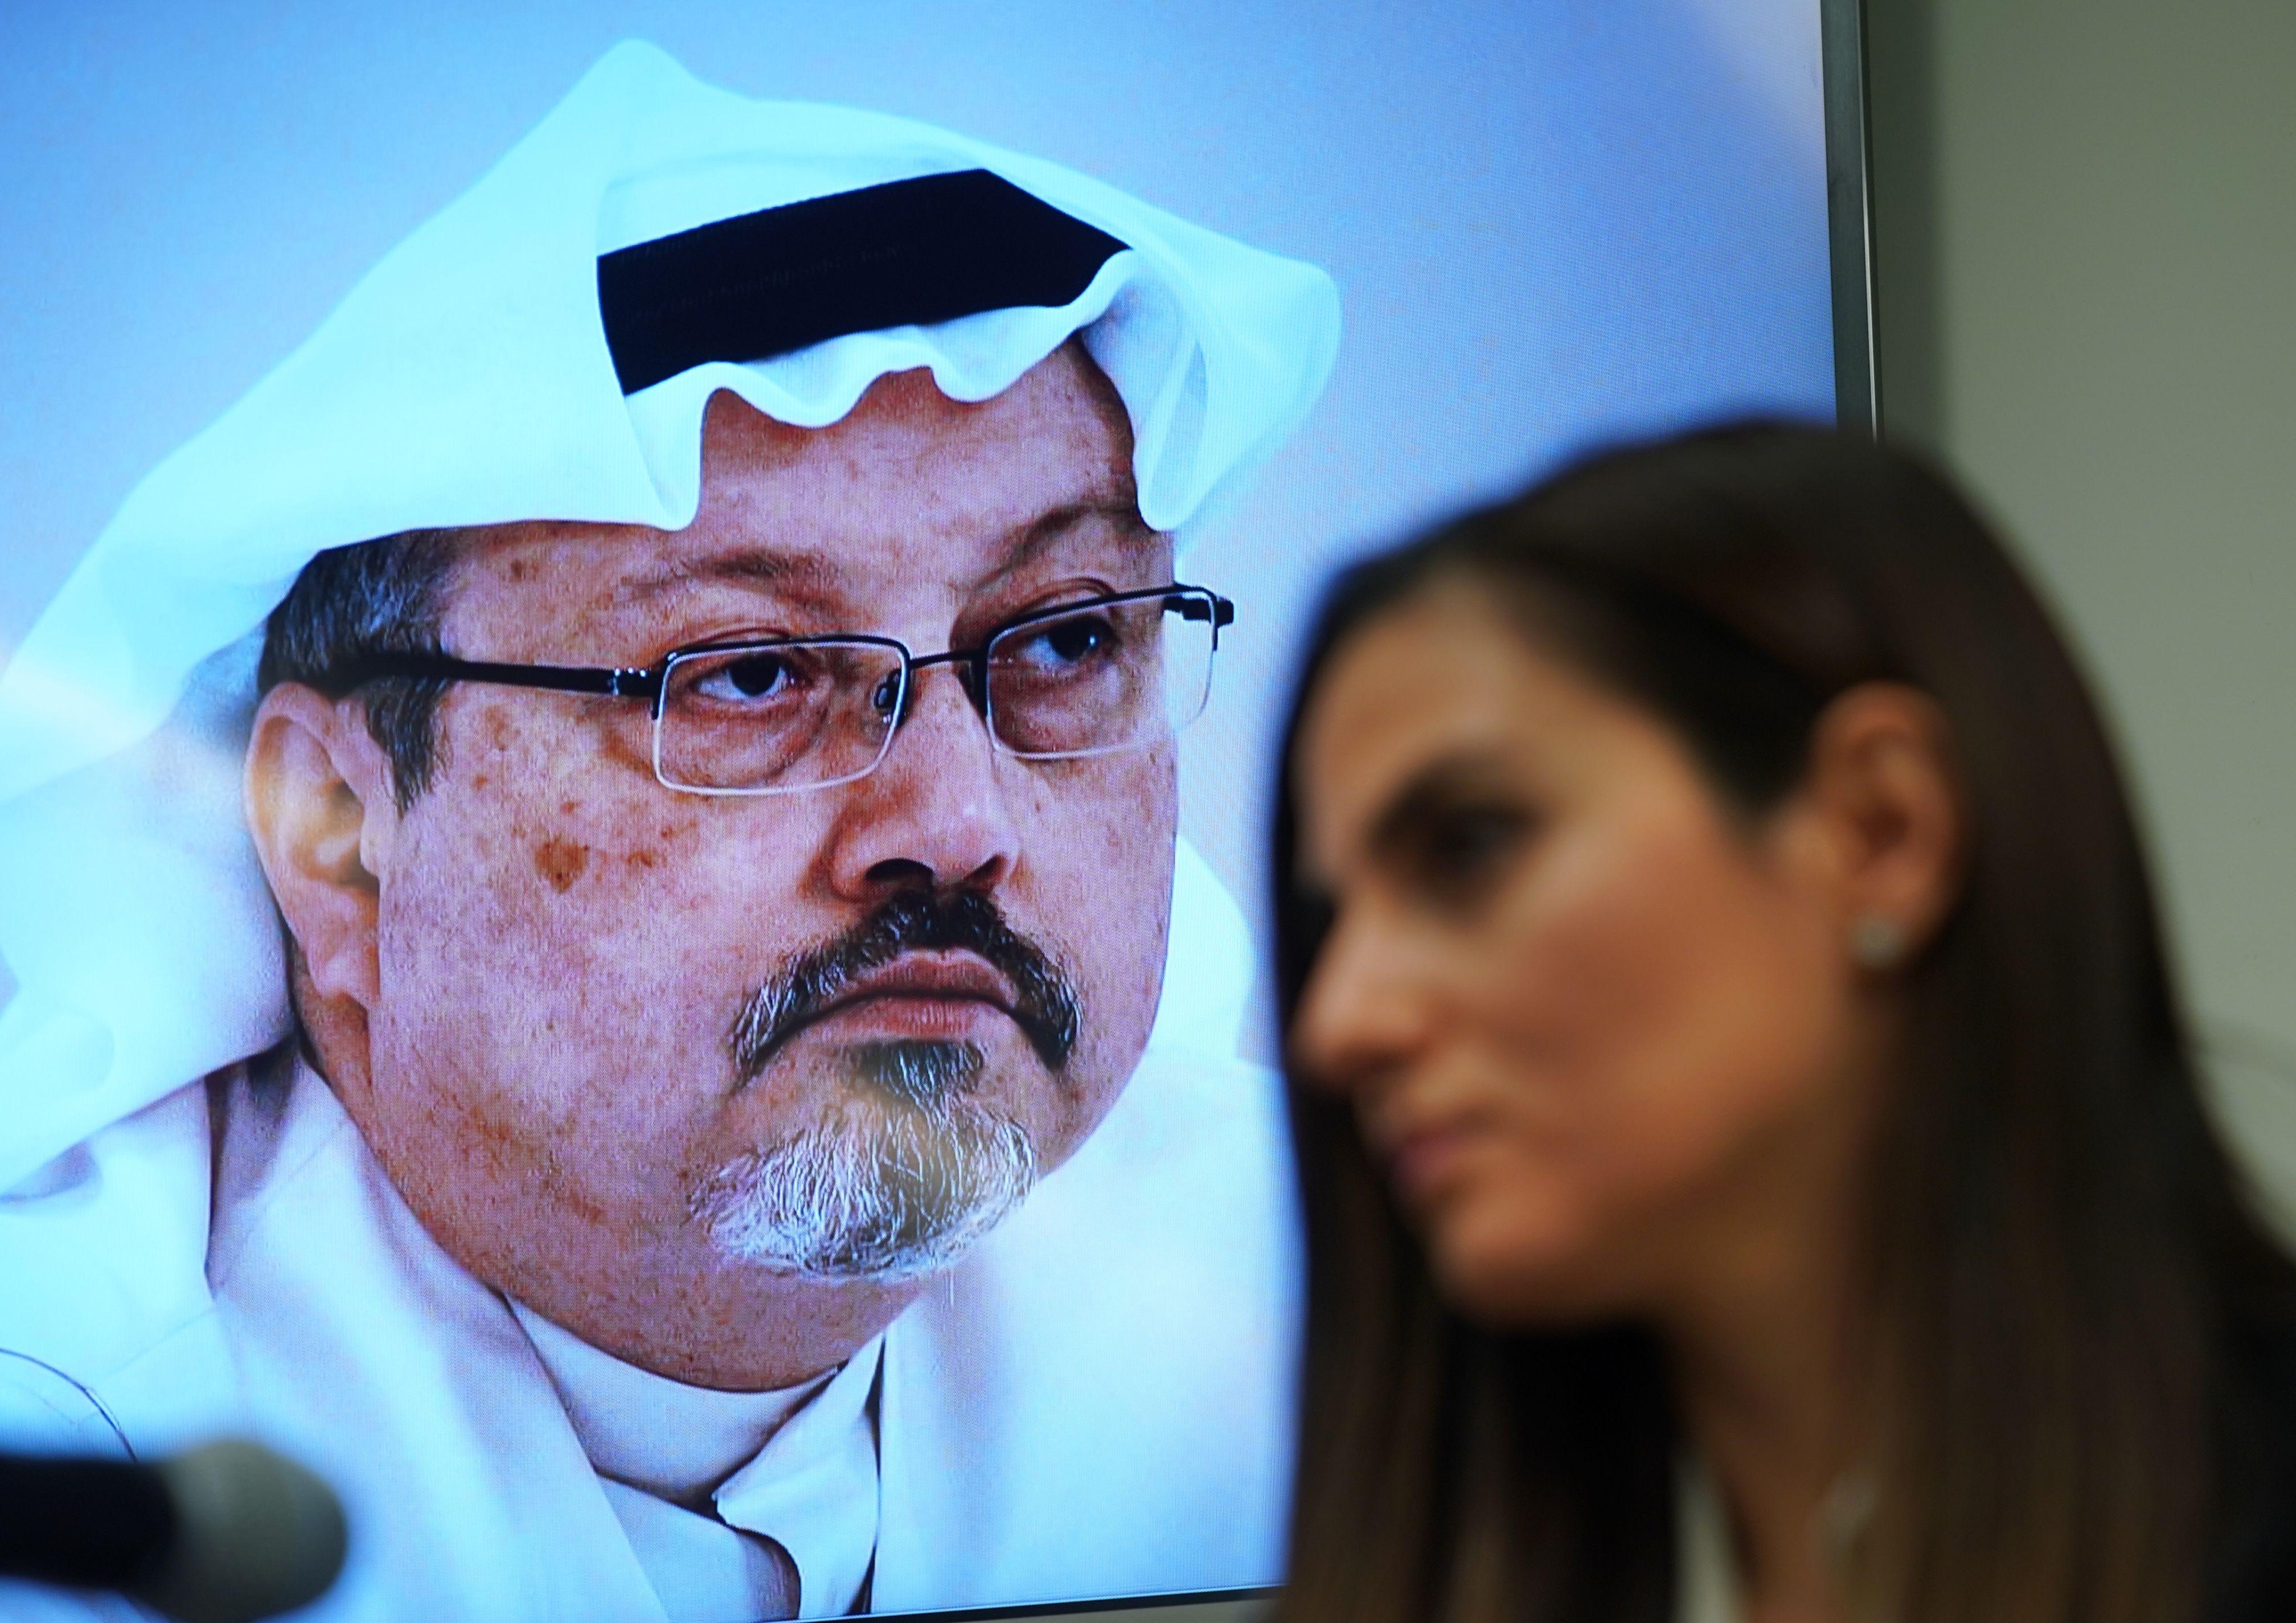 Saudi officials confirm Washington Post journalist Jamal Khashoggi died  inside consulate